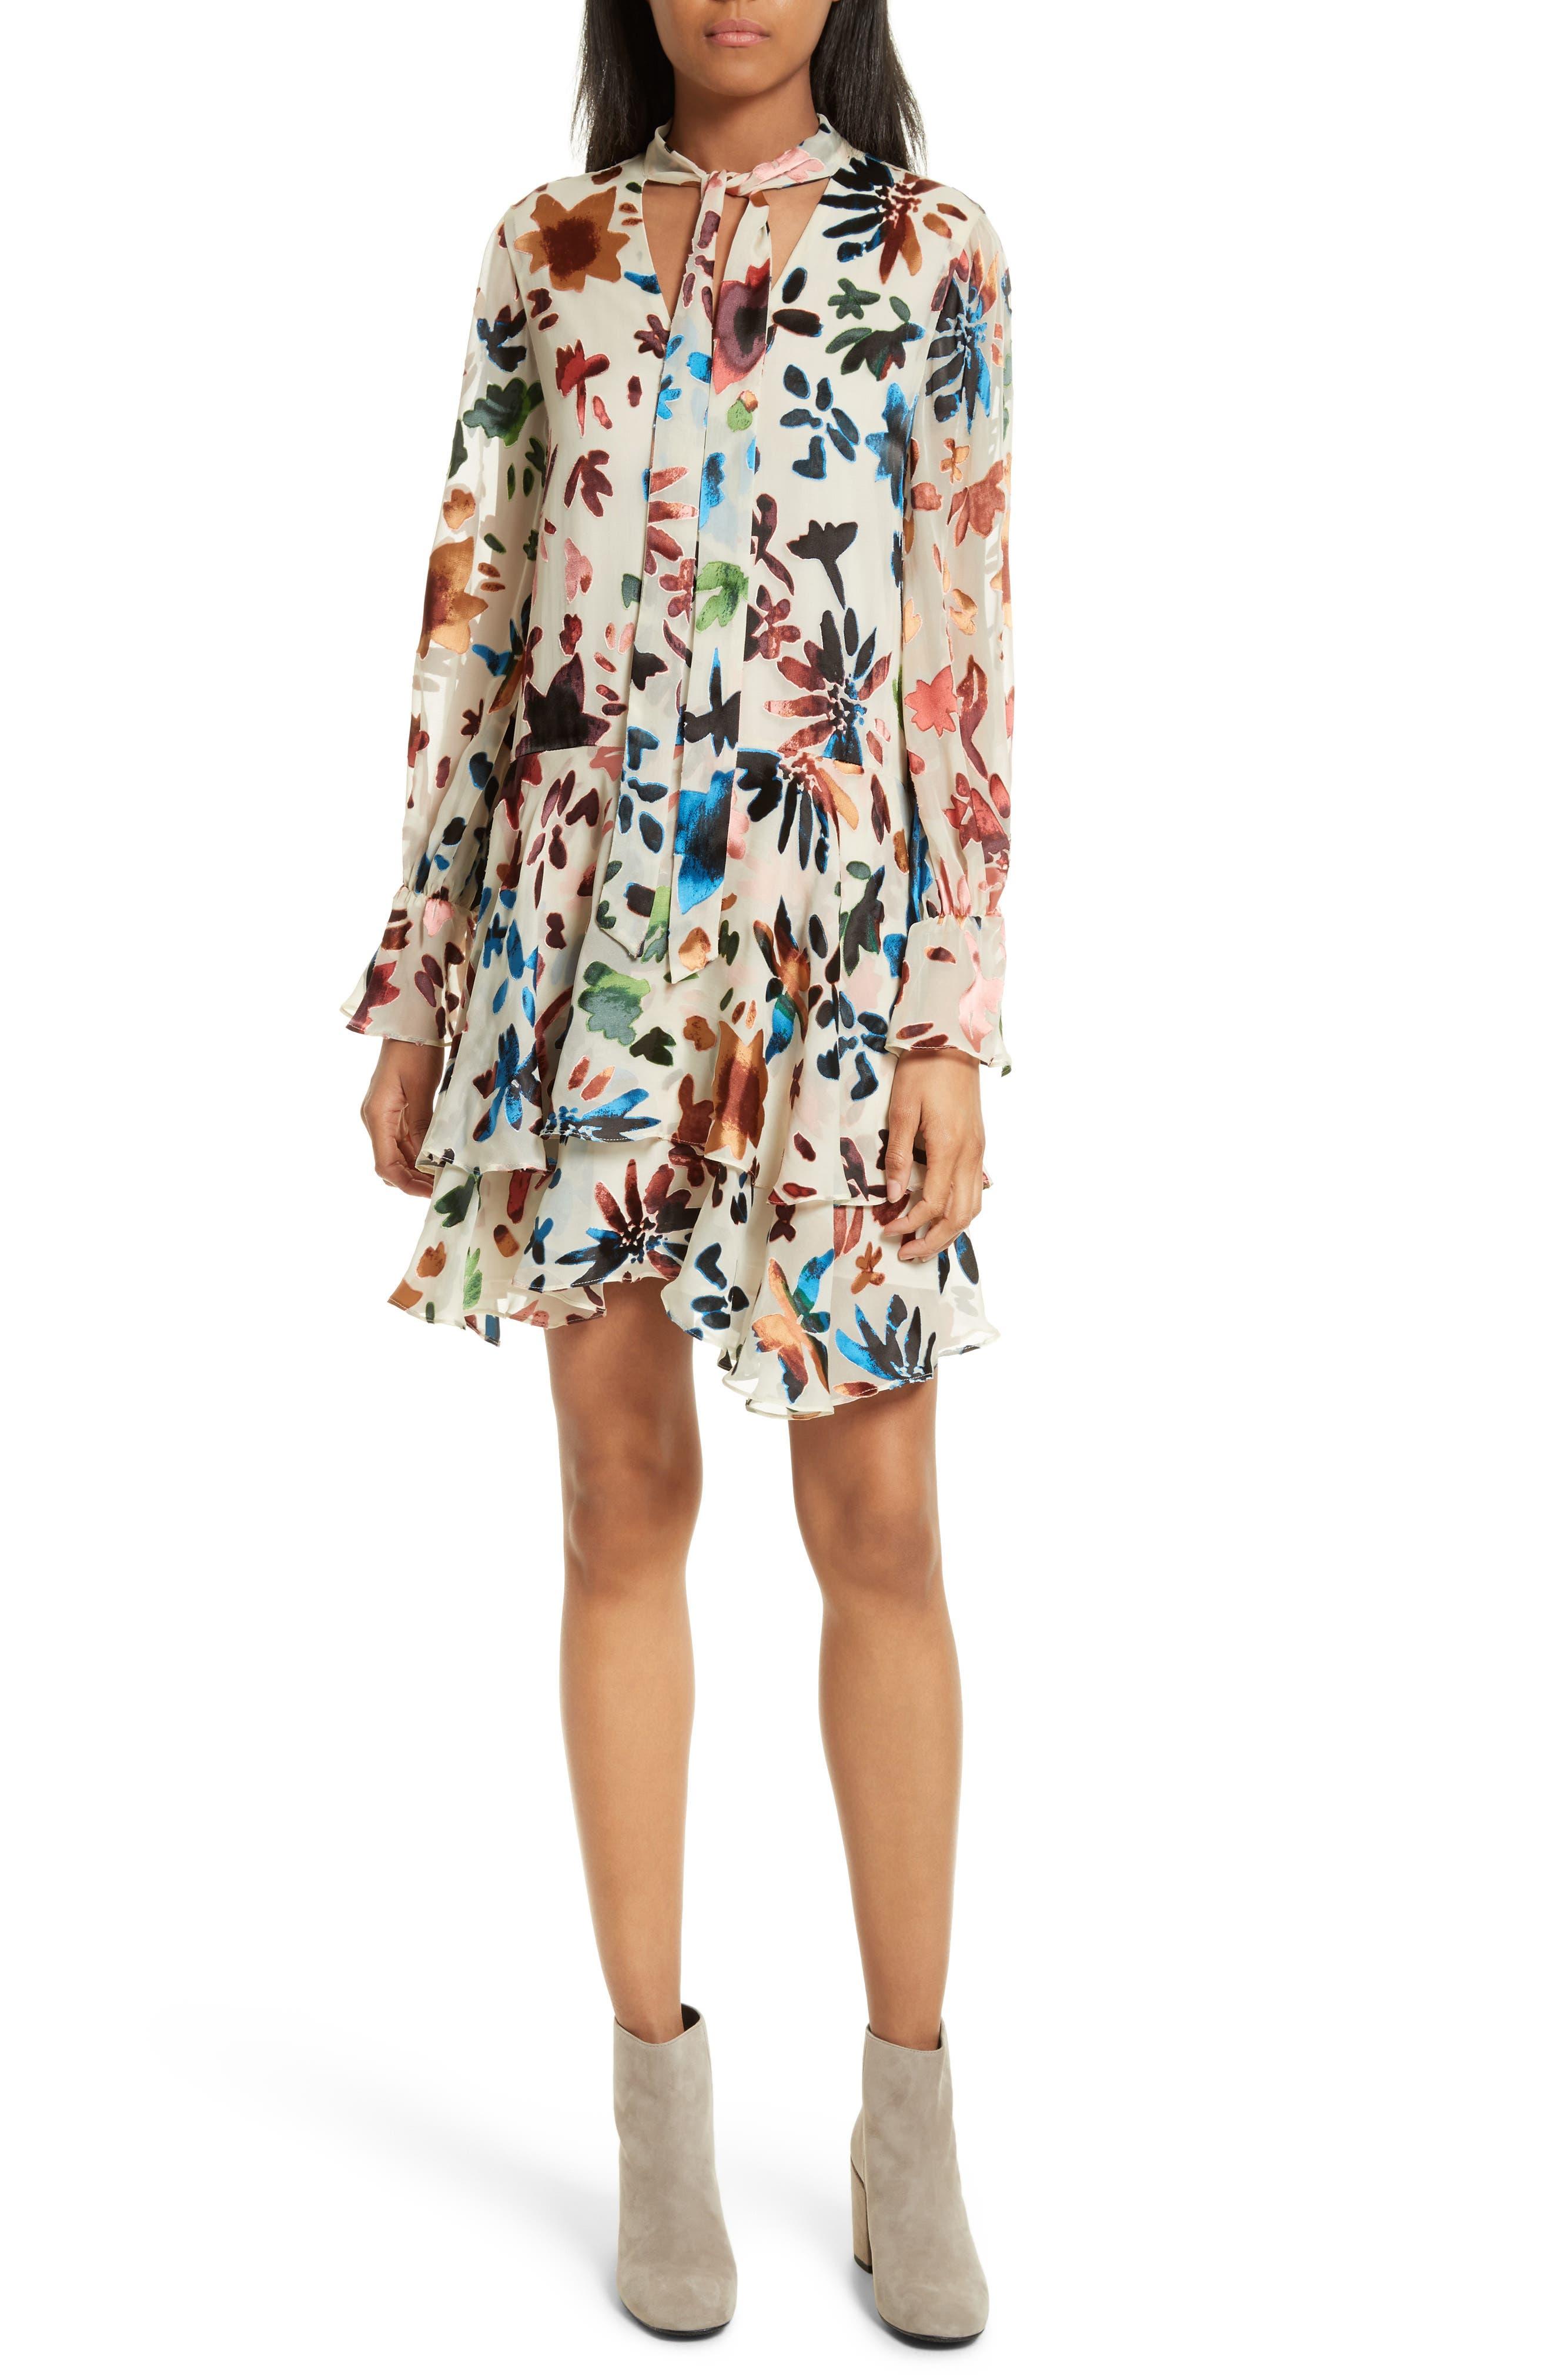 Alice + Olivia Moran Tiered Floral A-Line Dress